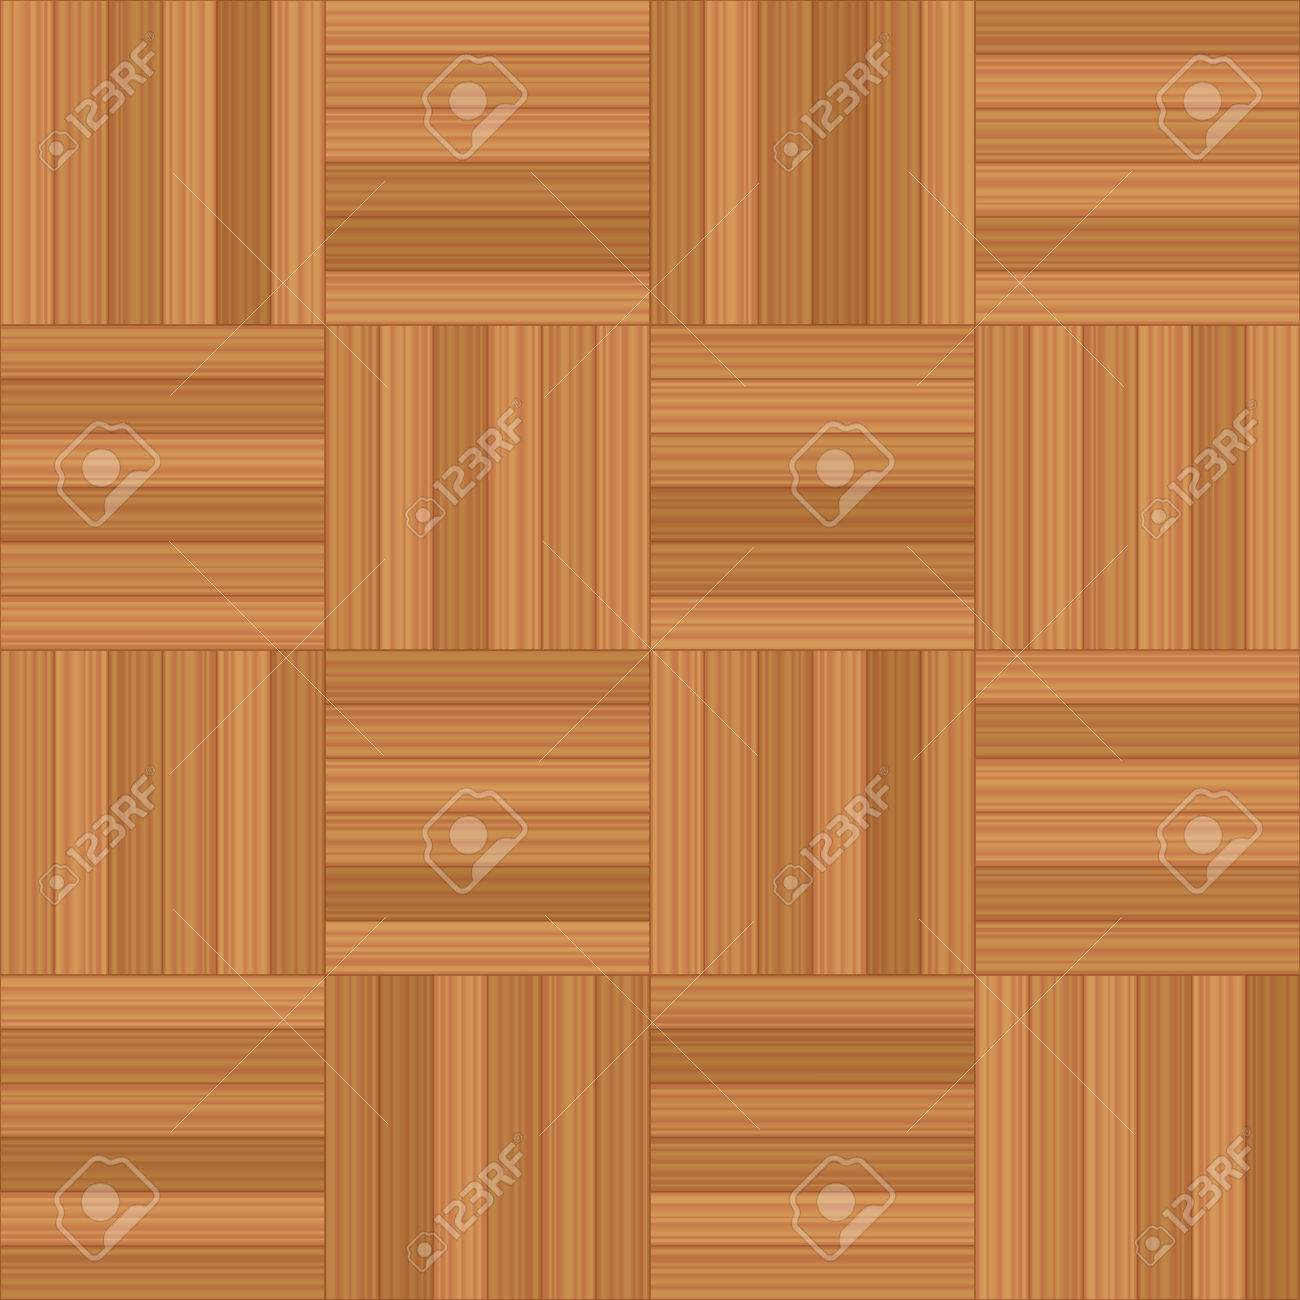 Mosaic Parquet Vector Illustration Of Square Wooden Floor Pattern